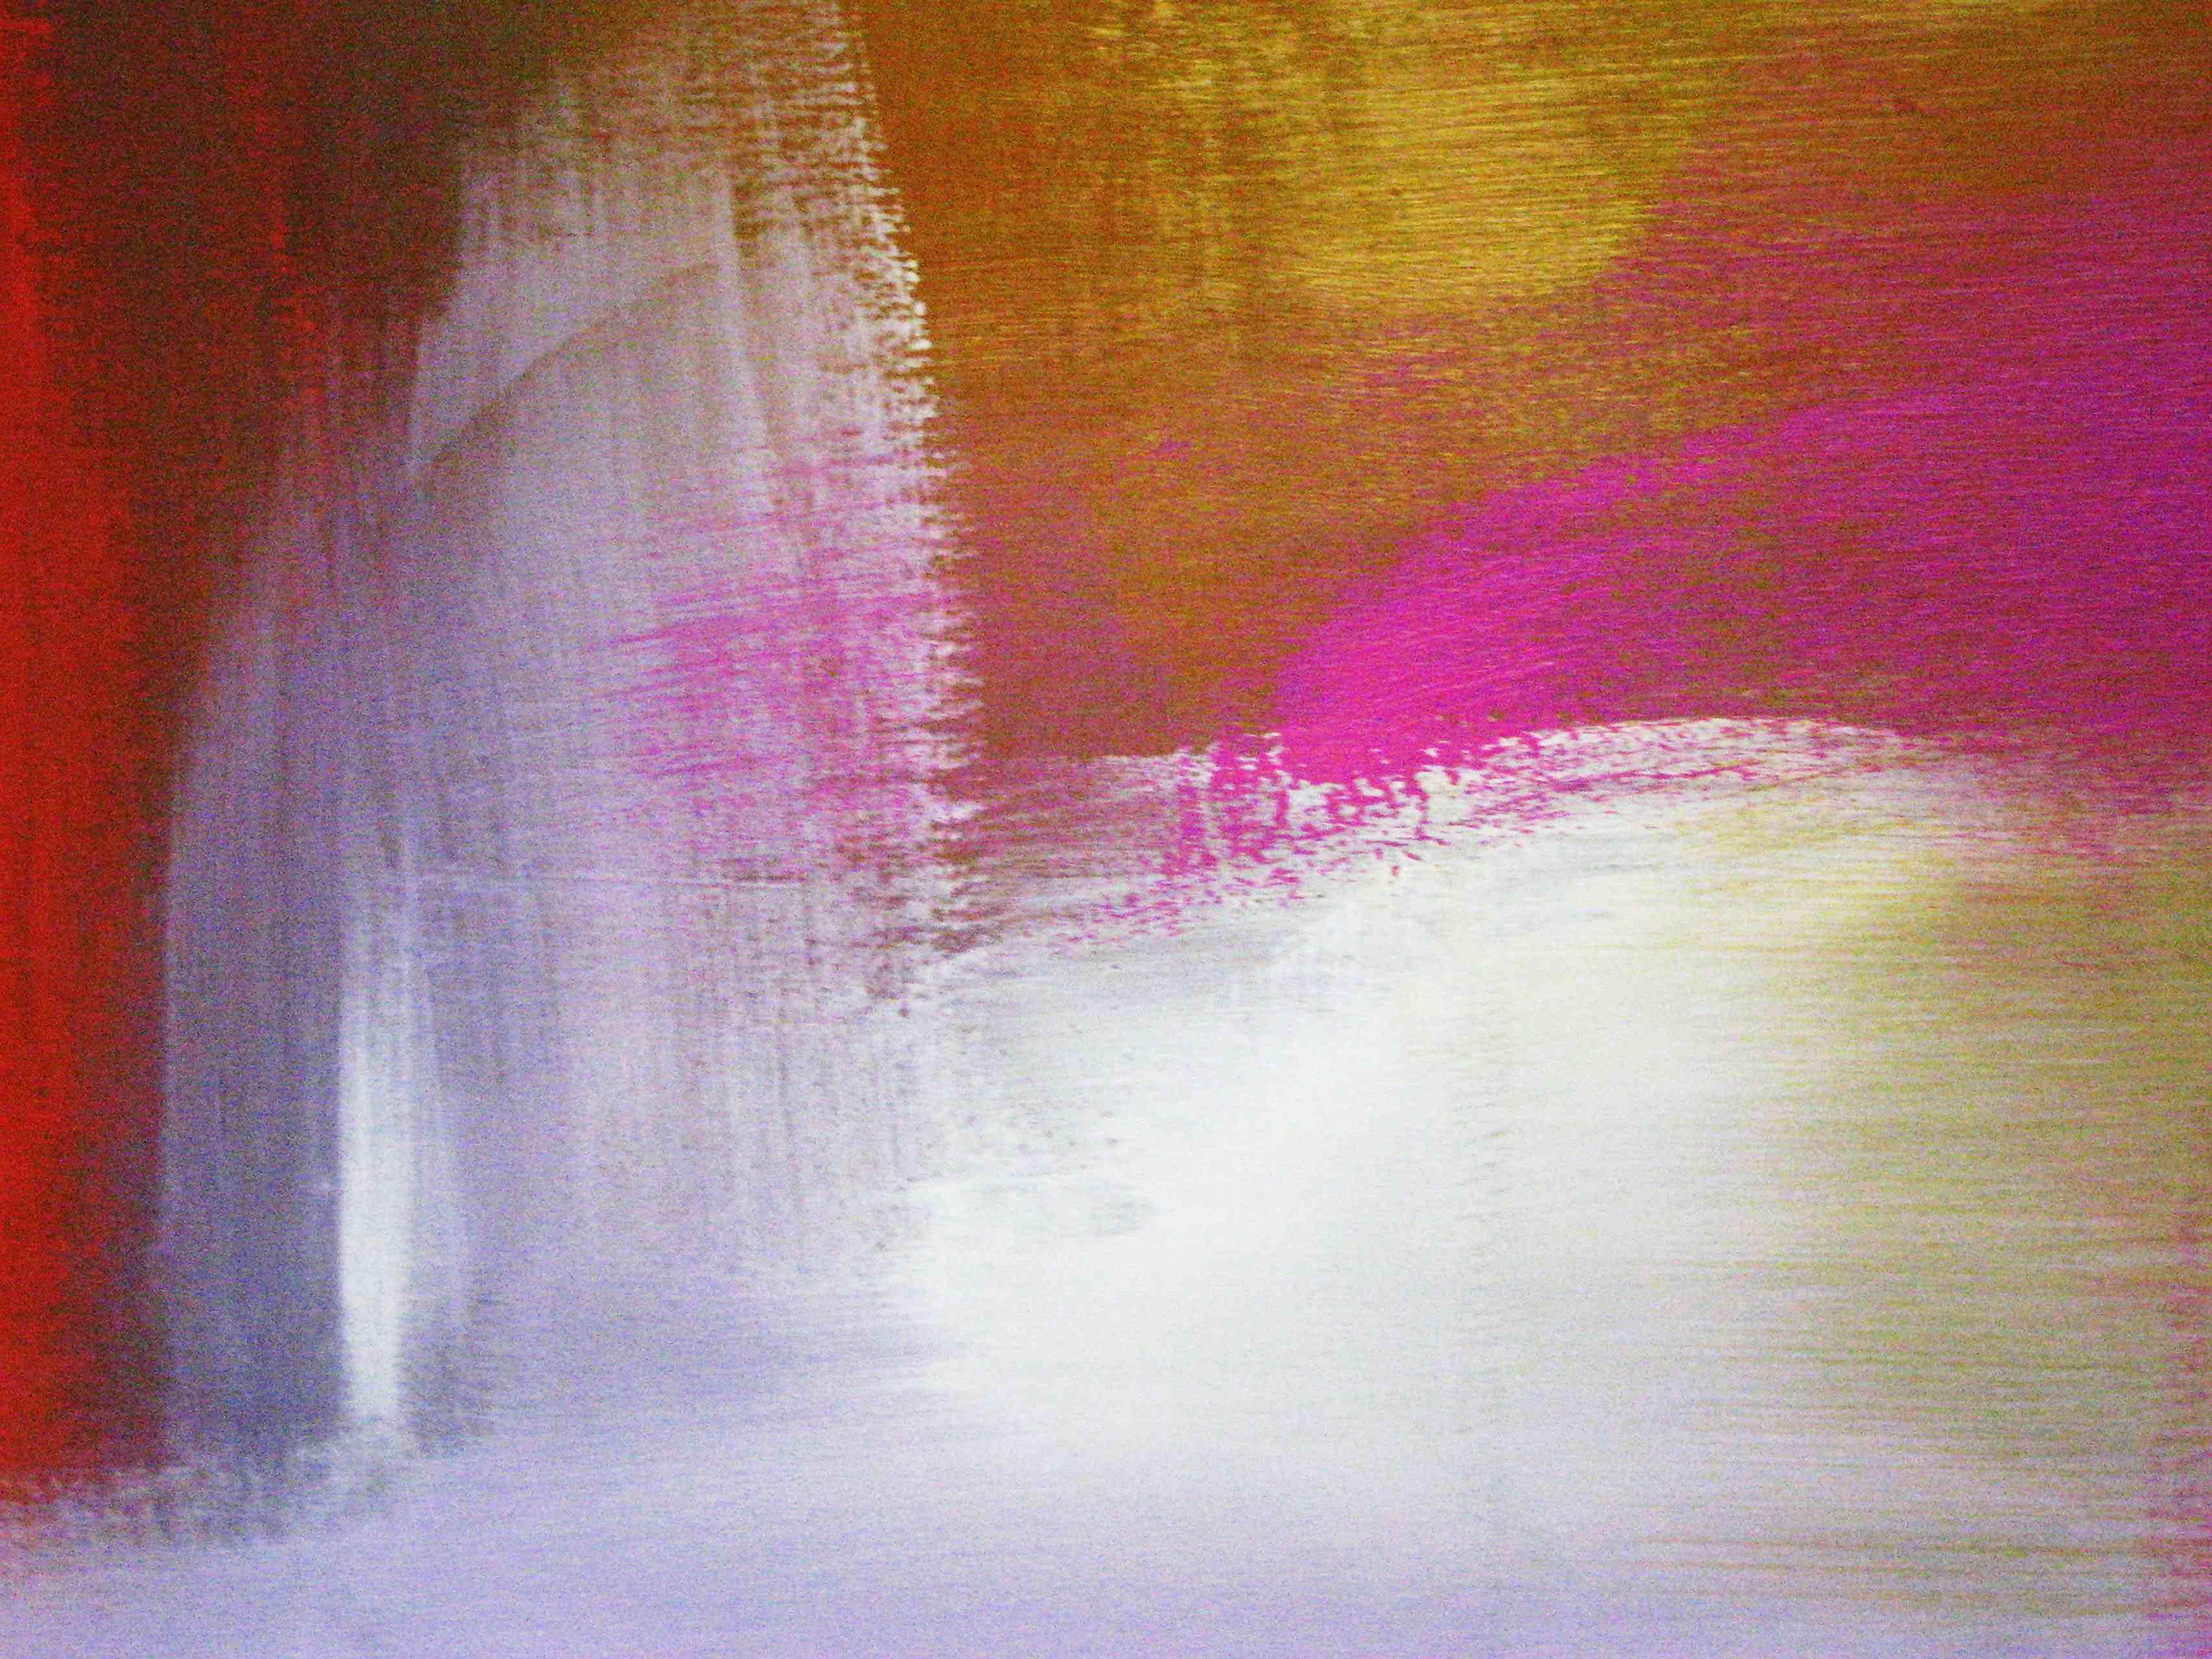 La Vida en Rosa by Tania Alcala